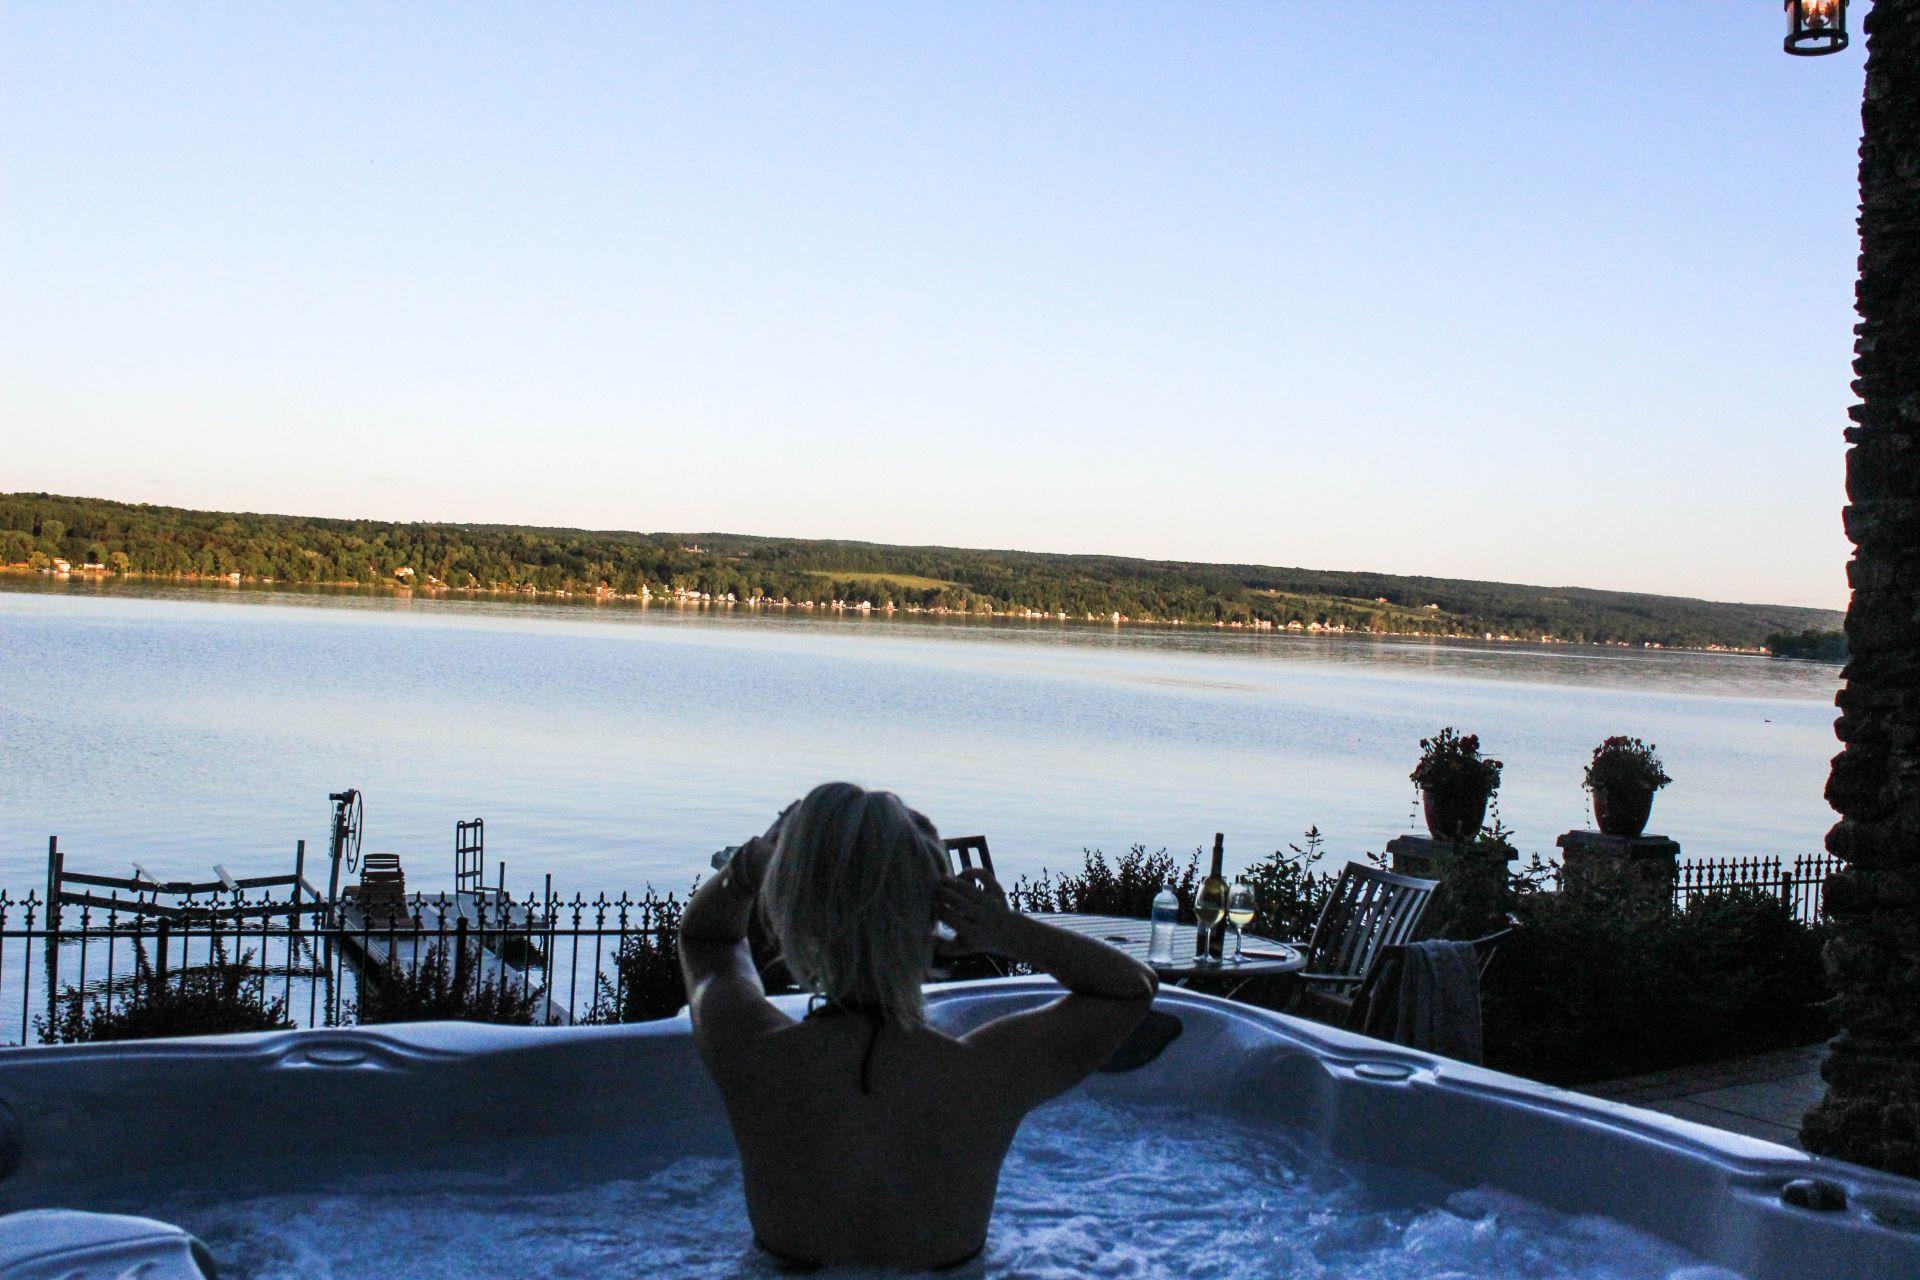 the steamboat castle, finger lakes, new york